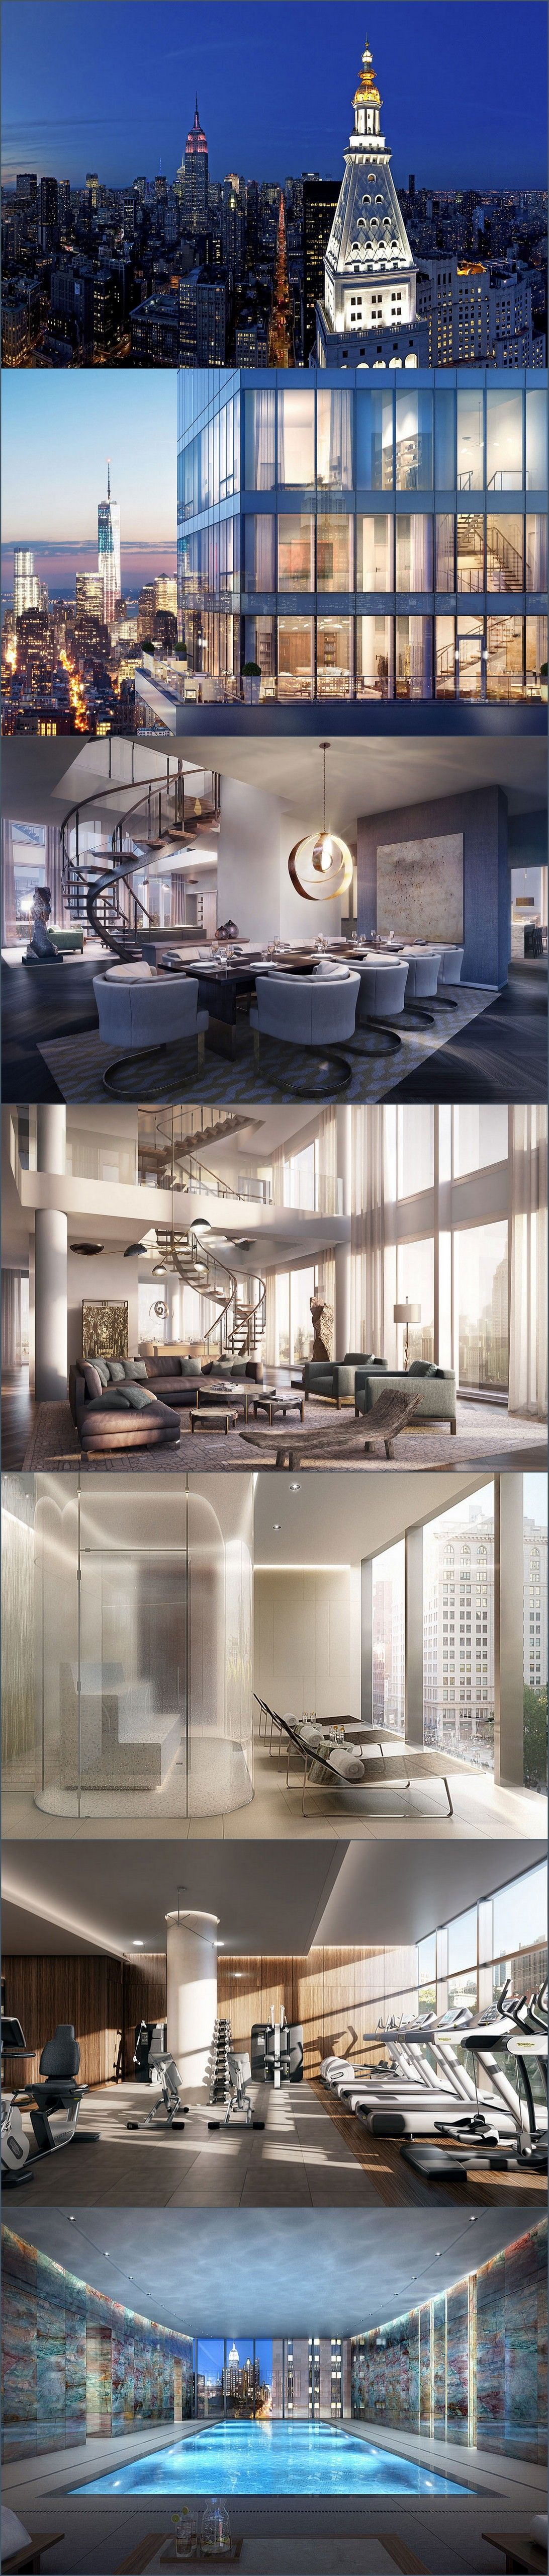 amazing new york penthouse luxury architecture pinterest haus haus ideen und luxus. Black Bedroom Furniture Sets. Home Design Ideas